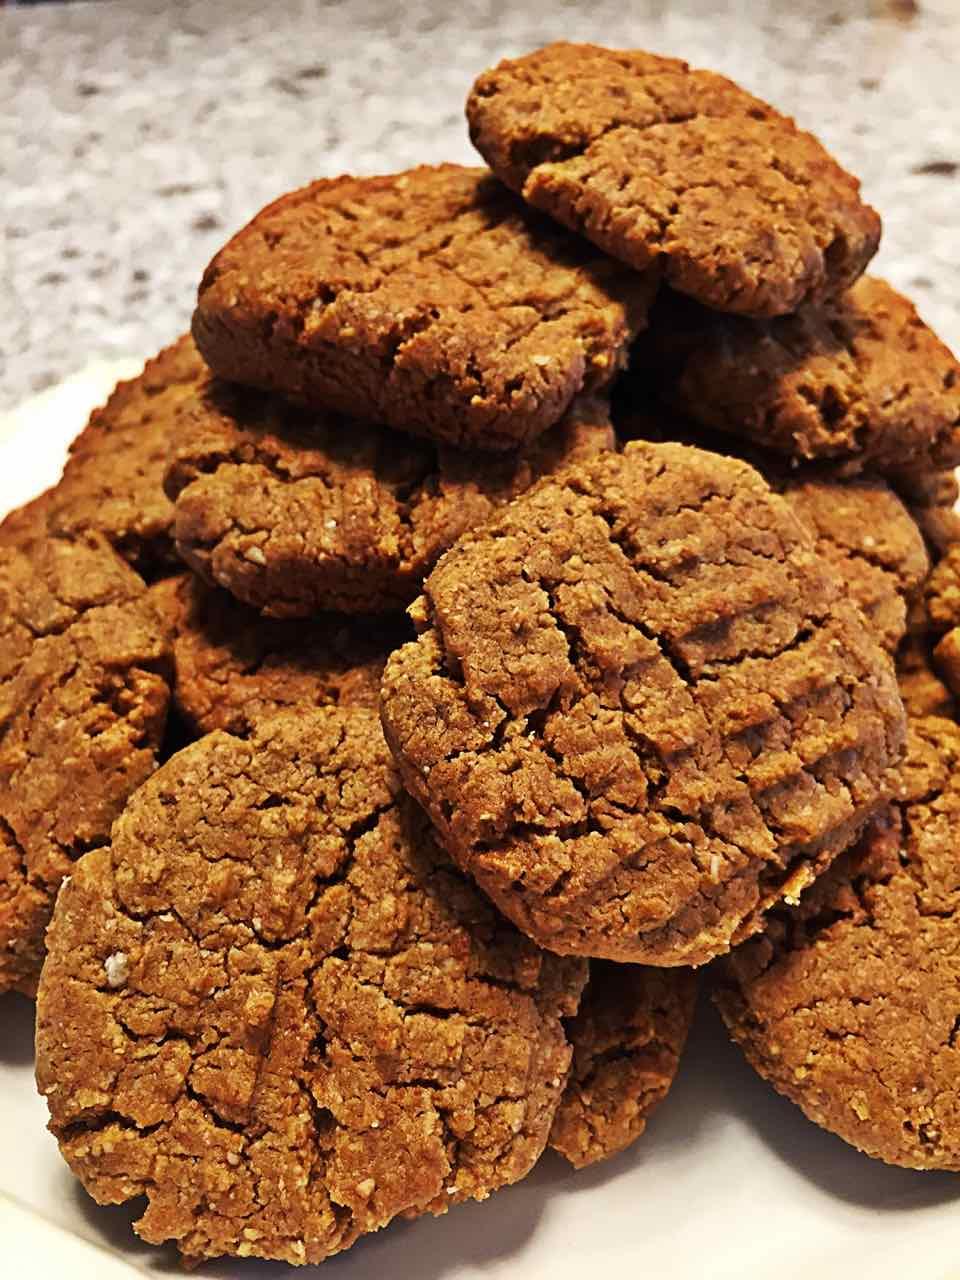 Image of vegan irresistible peanut butter cookies